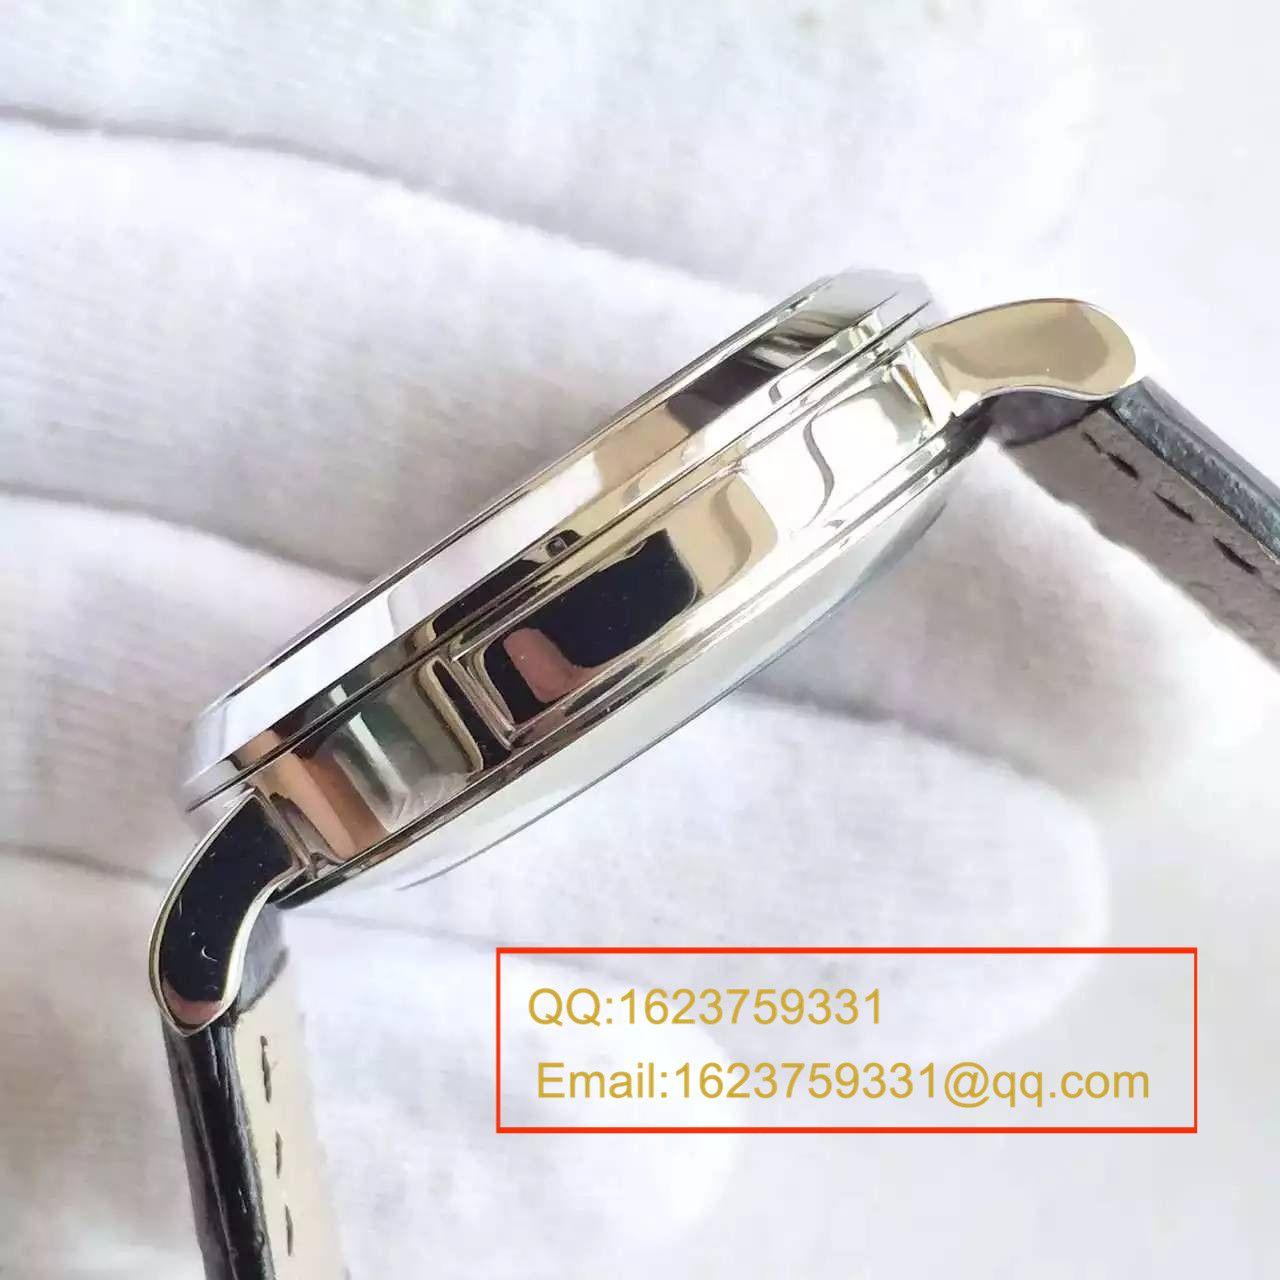 【HT一比一超A高仿手表】百达翡丽-复杂功能计时腕表系列 5078P-001 机械男表